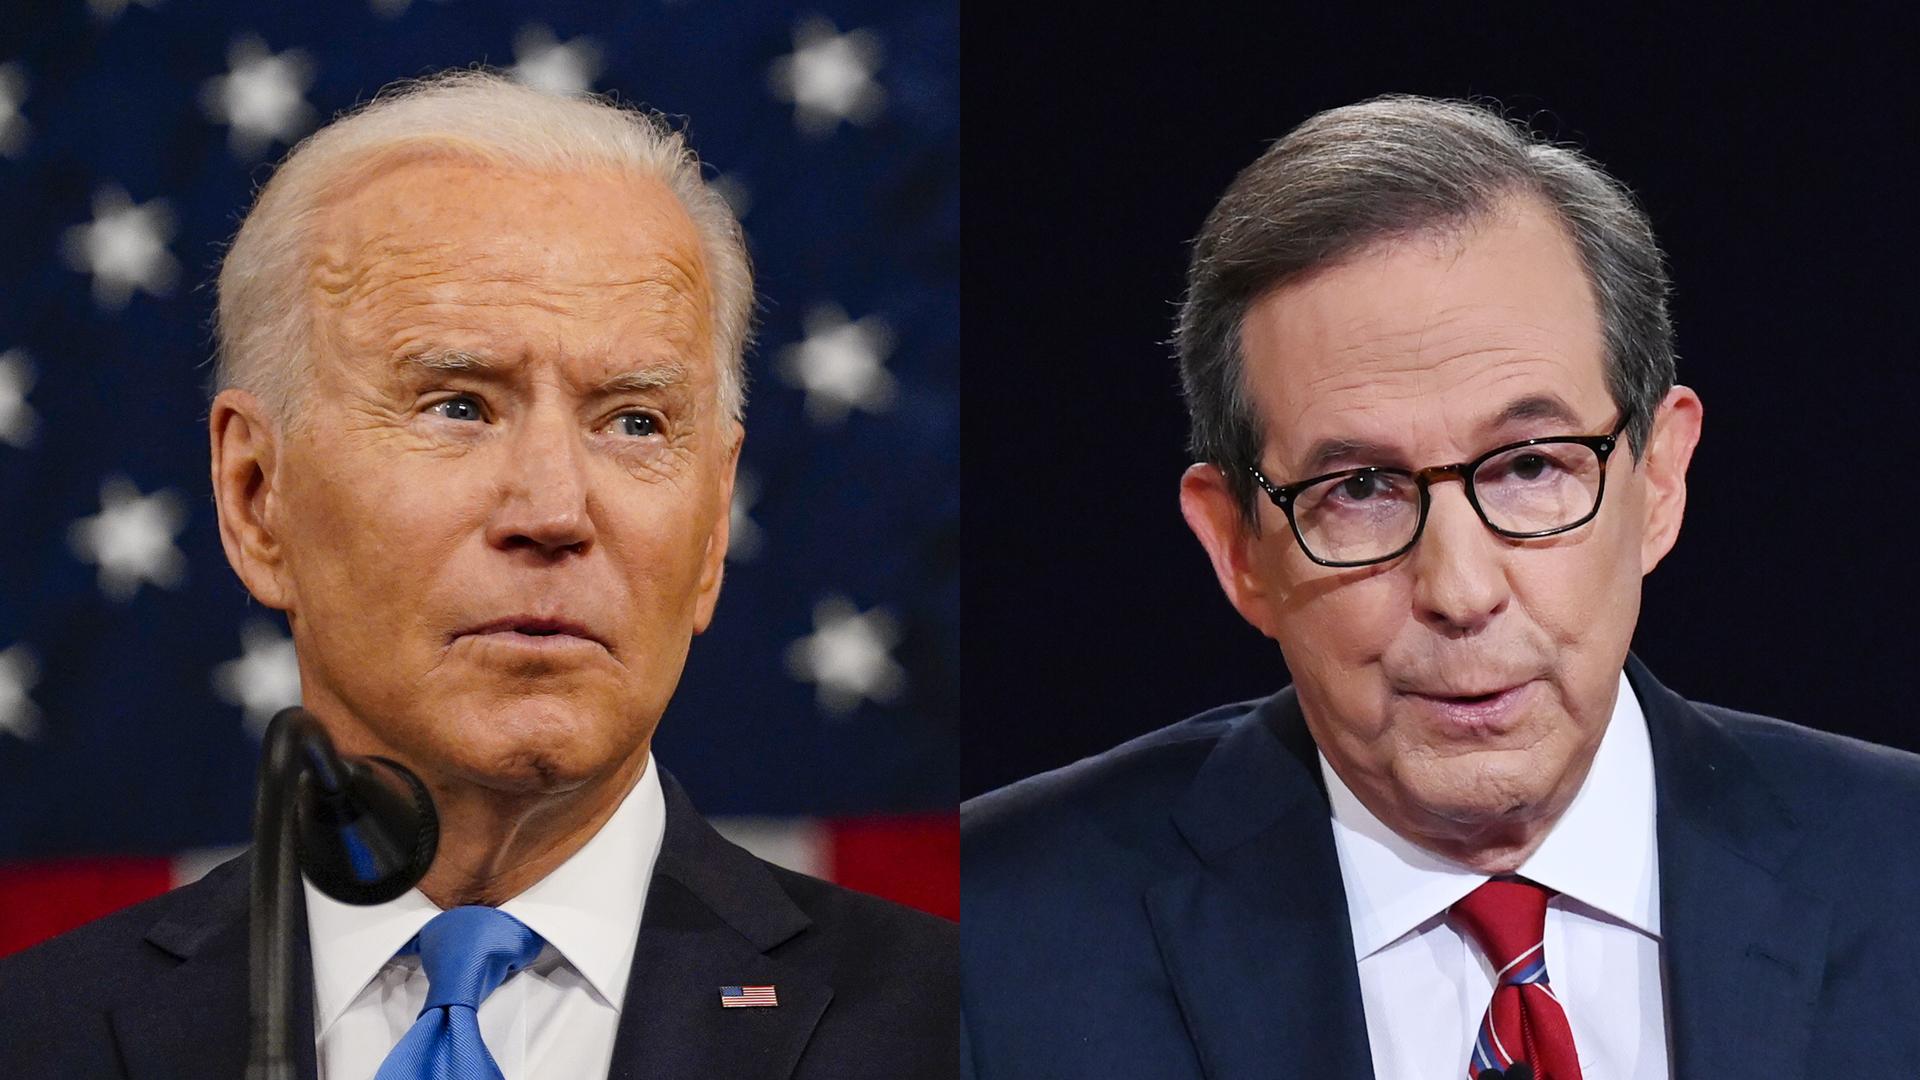 Chris Wallace praises President Biden's address and predicts it will be 'a popular speech'